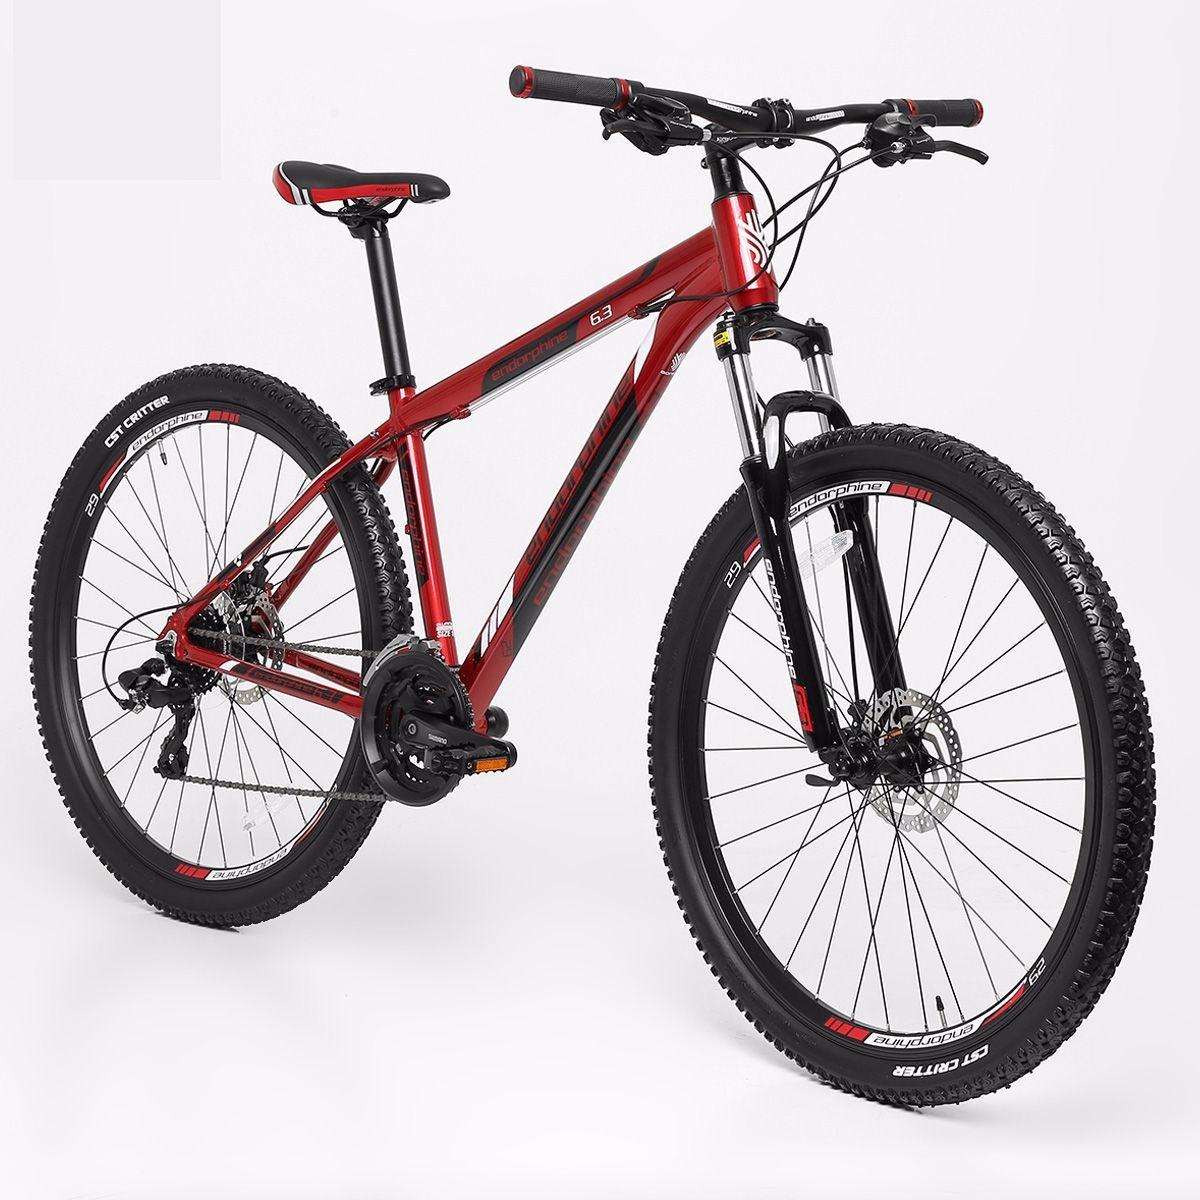 6038bcab5 bicicleta gonew endorphine 6.3 aluminio aro 29 vermelha. Carregando zoom.